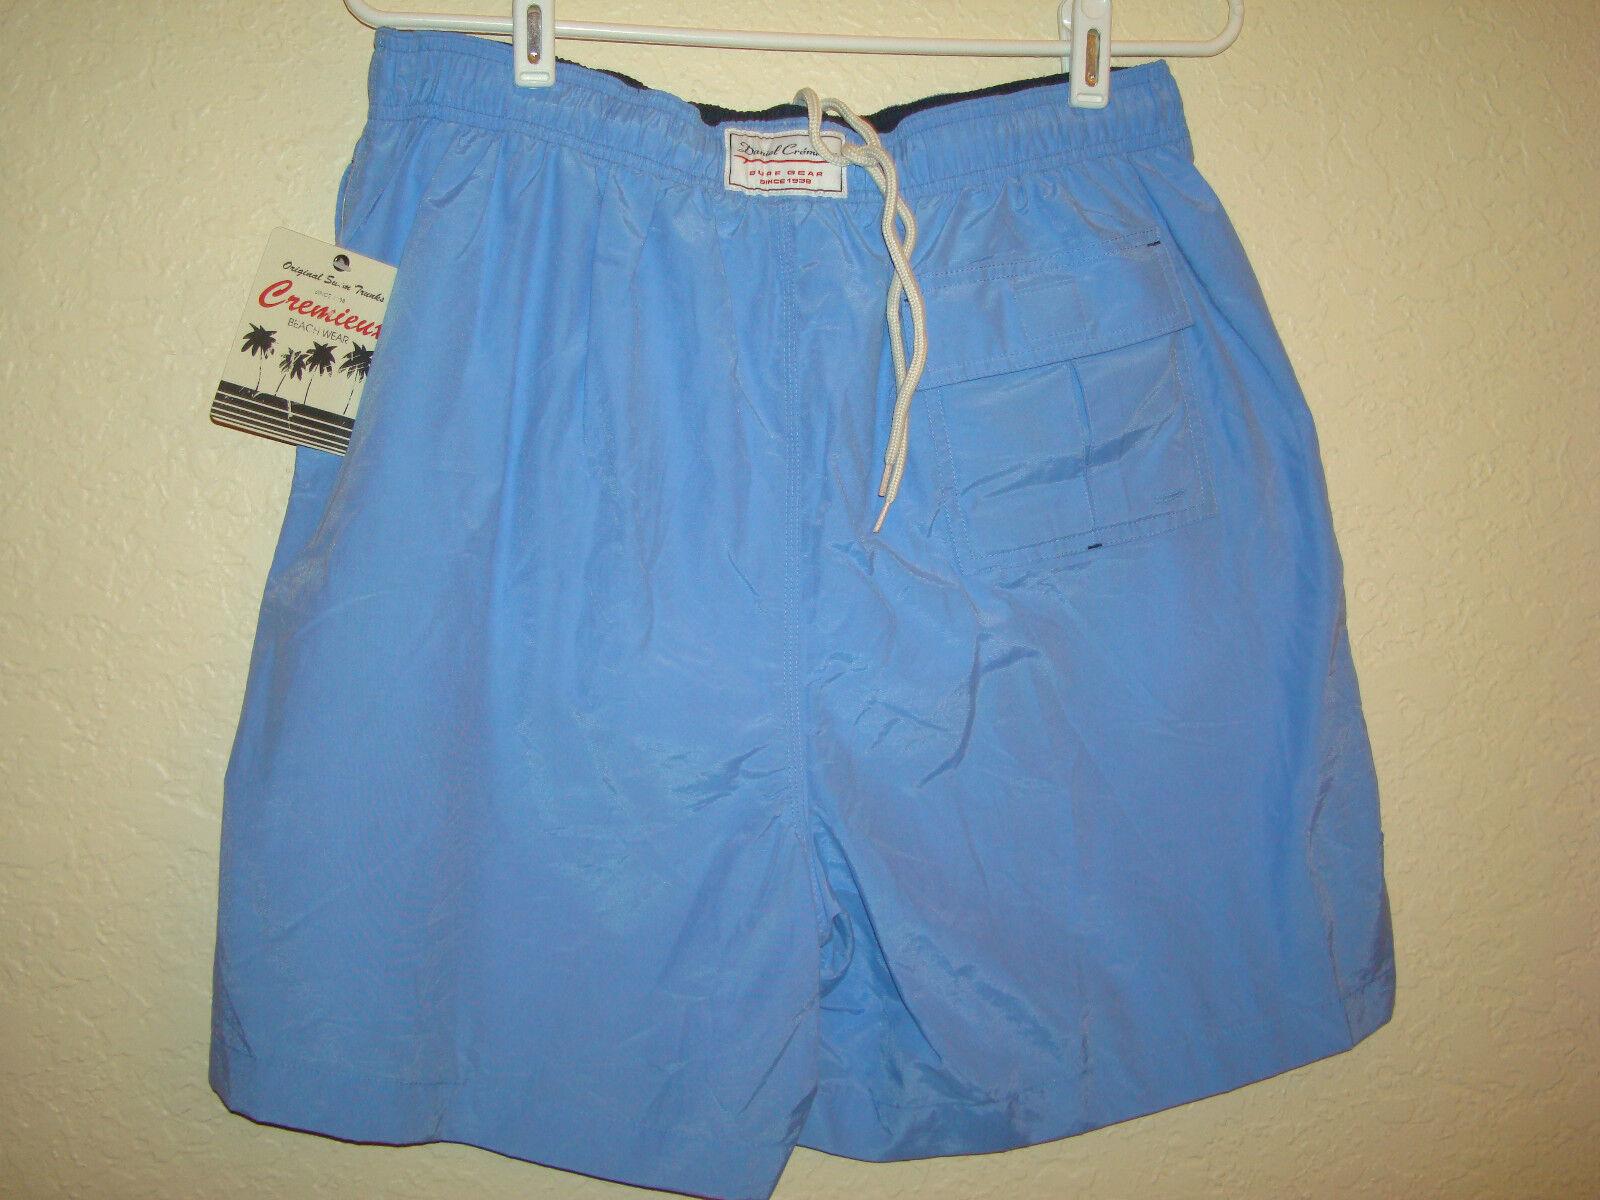 Nwt's Men's Cremiuex Beach Wear Cornflower bluee Swim Trunks-L